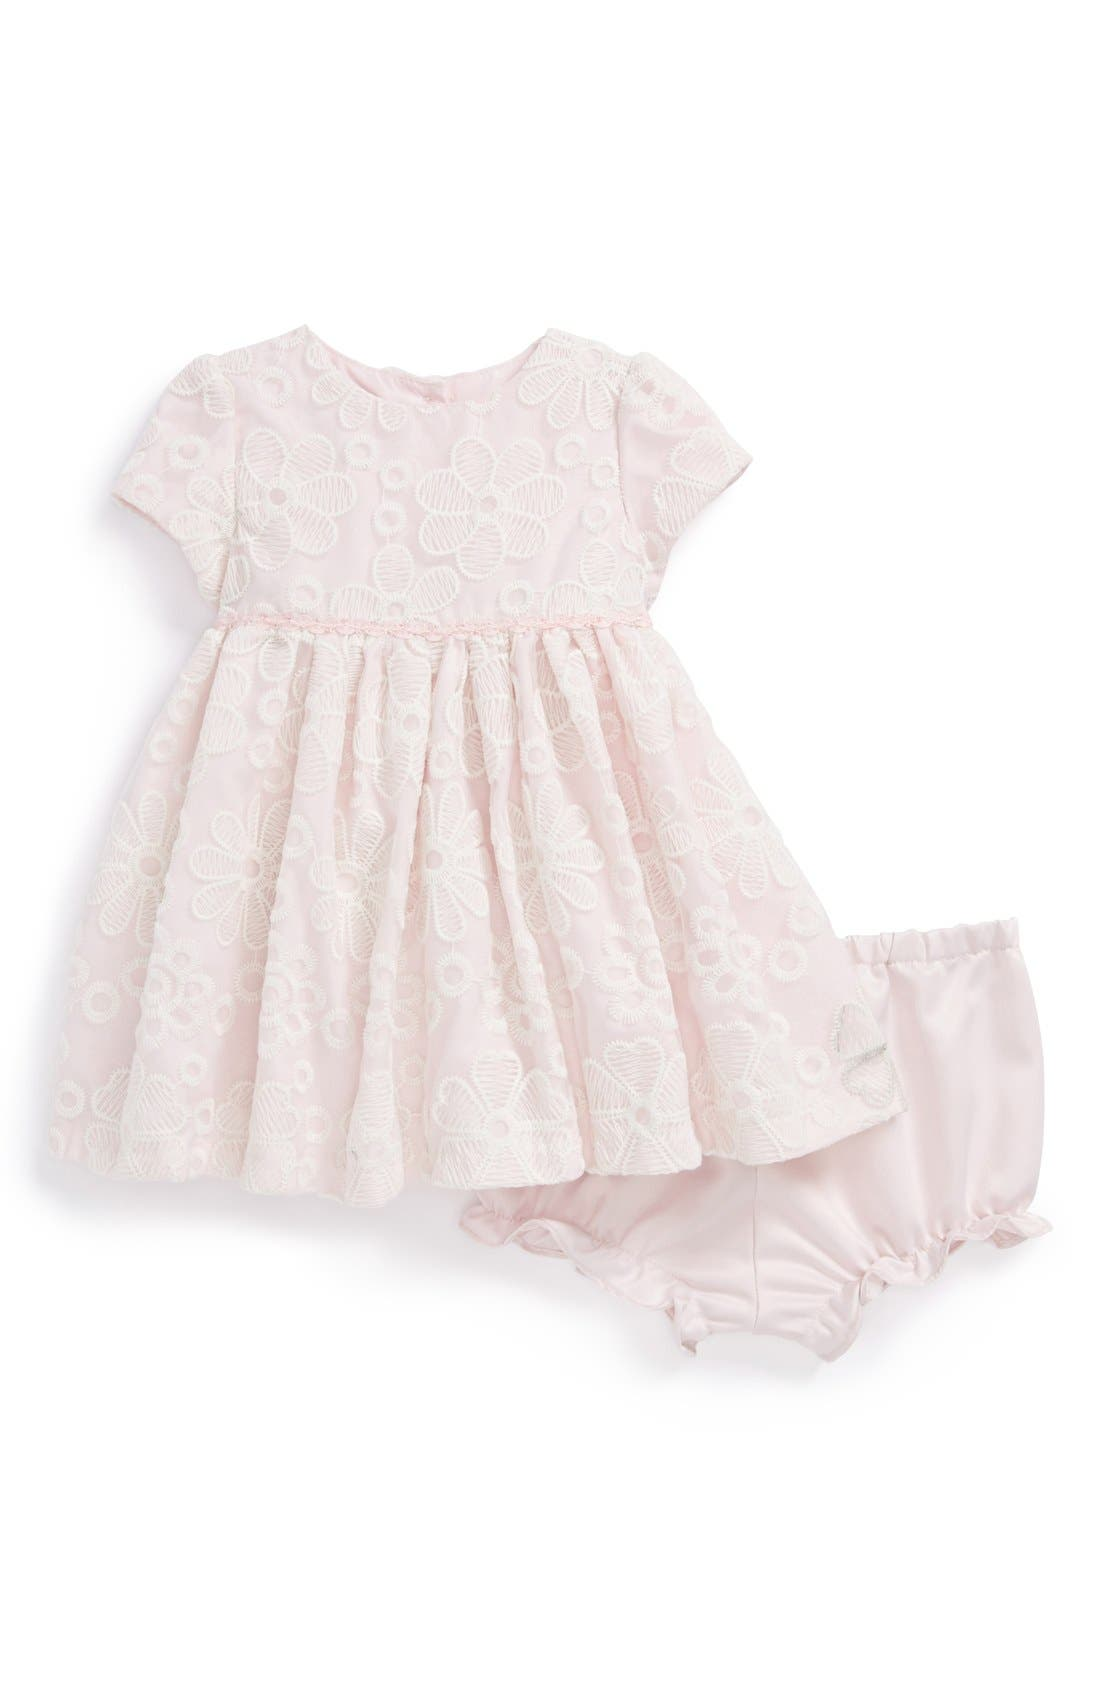 Main Image - Pippa & Julie Flower Lace Dress (Baby Girls)